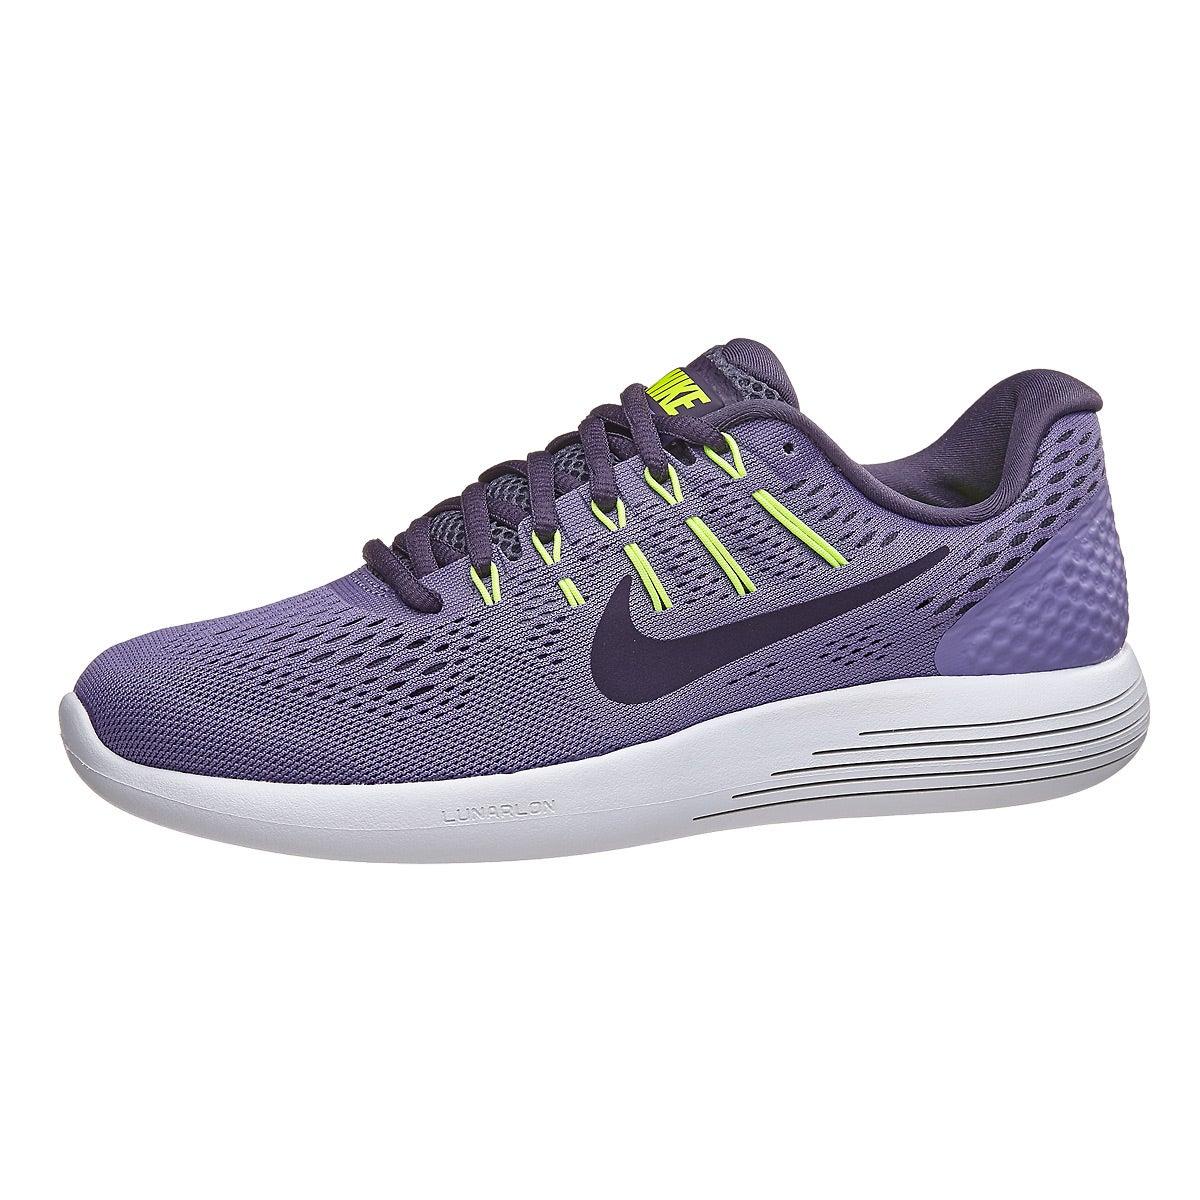 detailing eacb9 5d8c1 ... amazon nike lunarglide 8 womens shoes purple dark raisin 360 view running  warehouse. 556cf da921